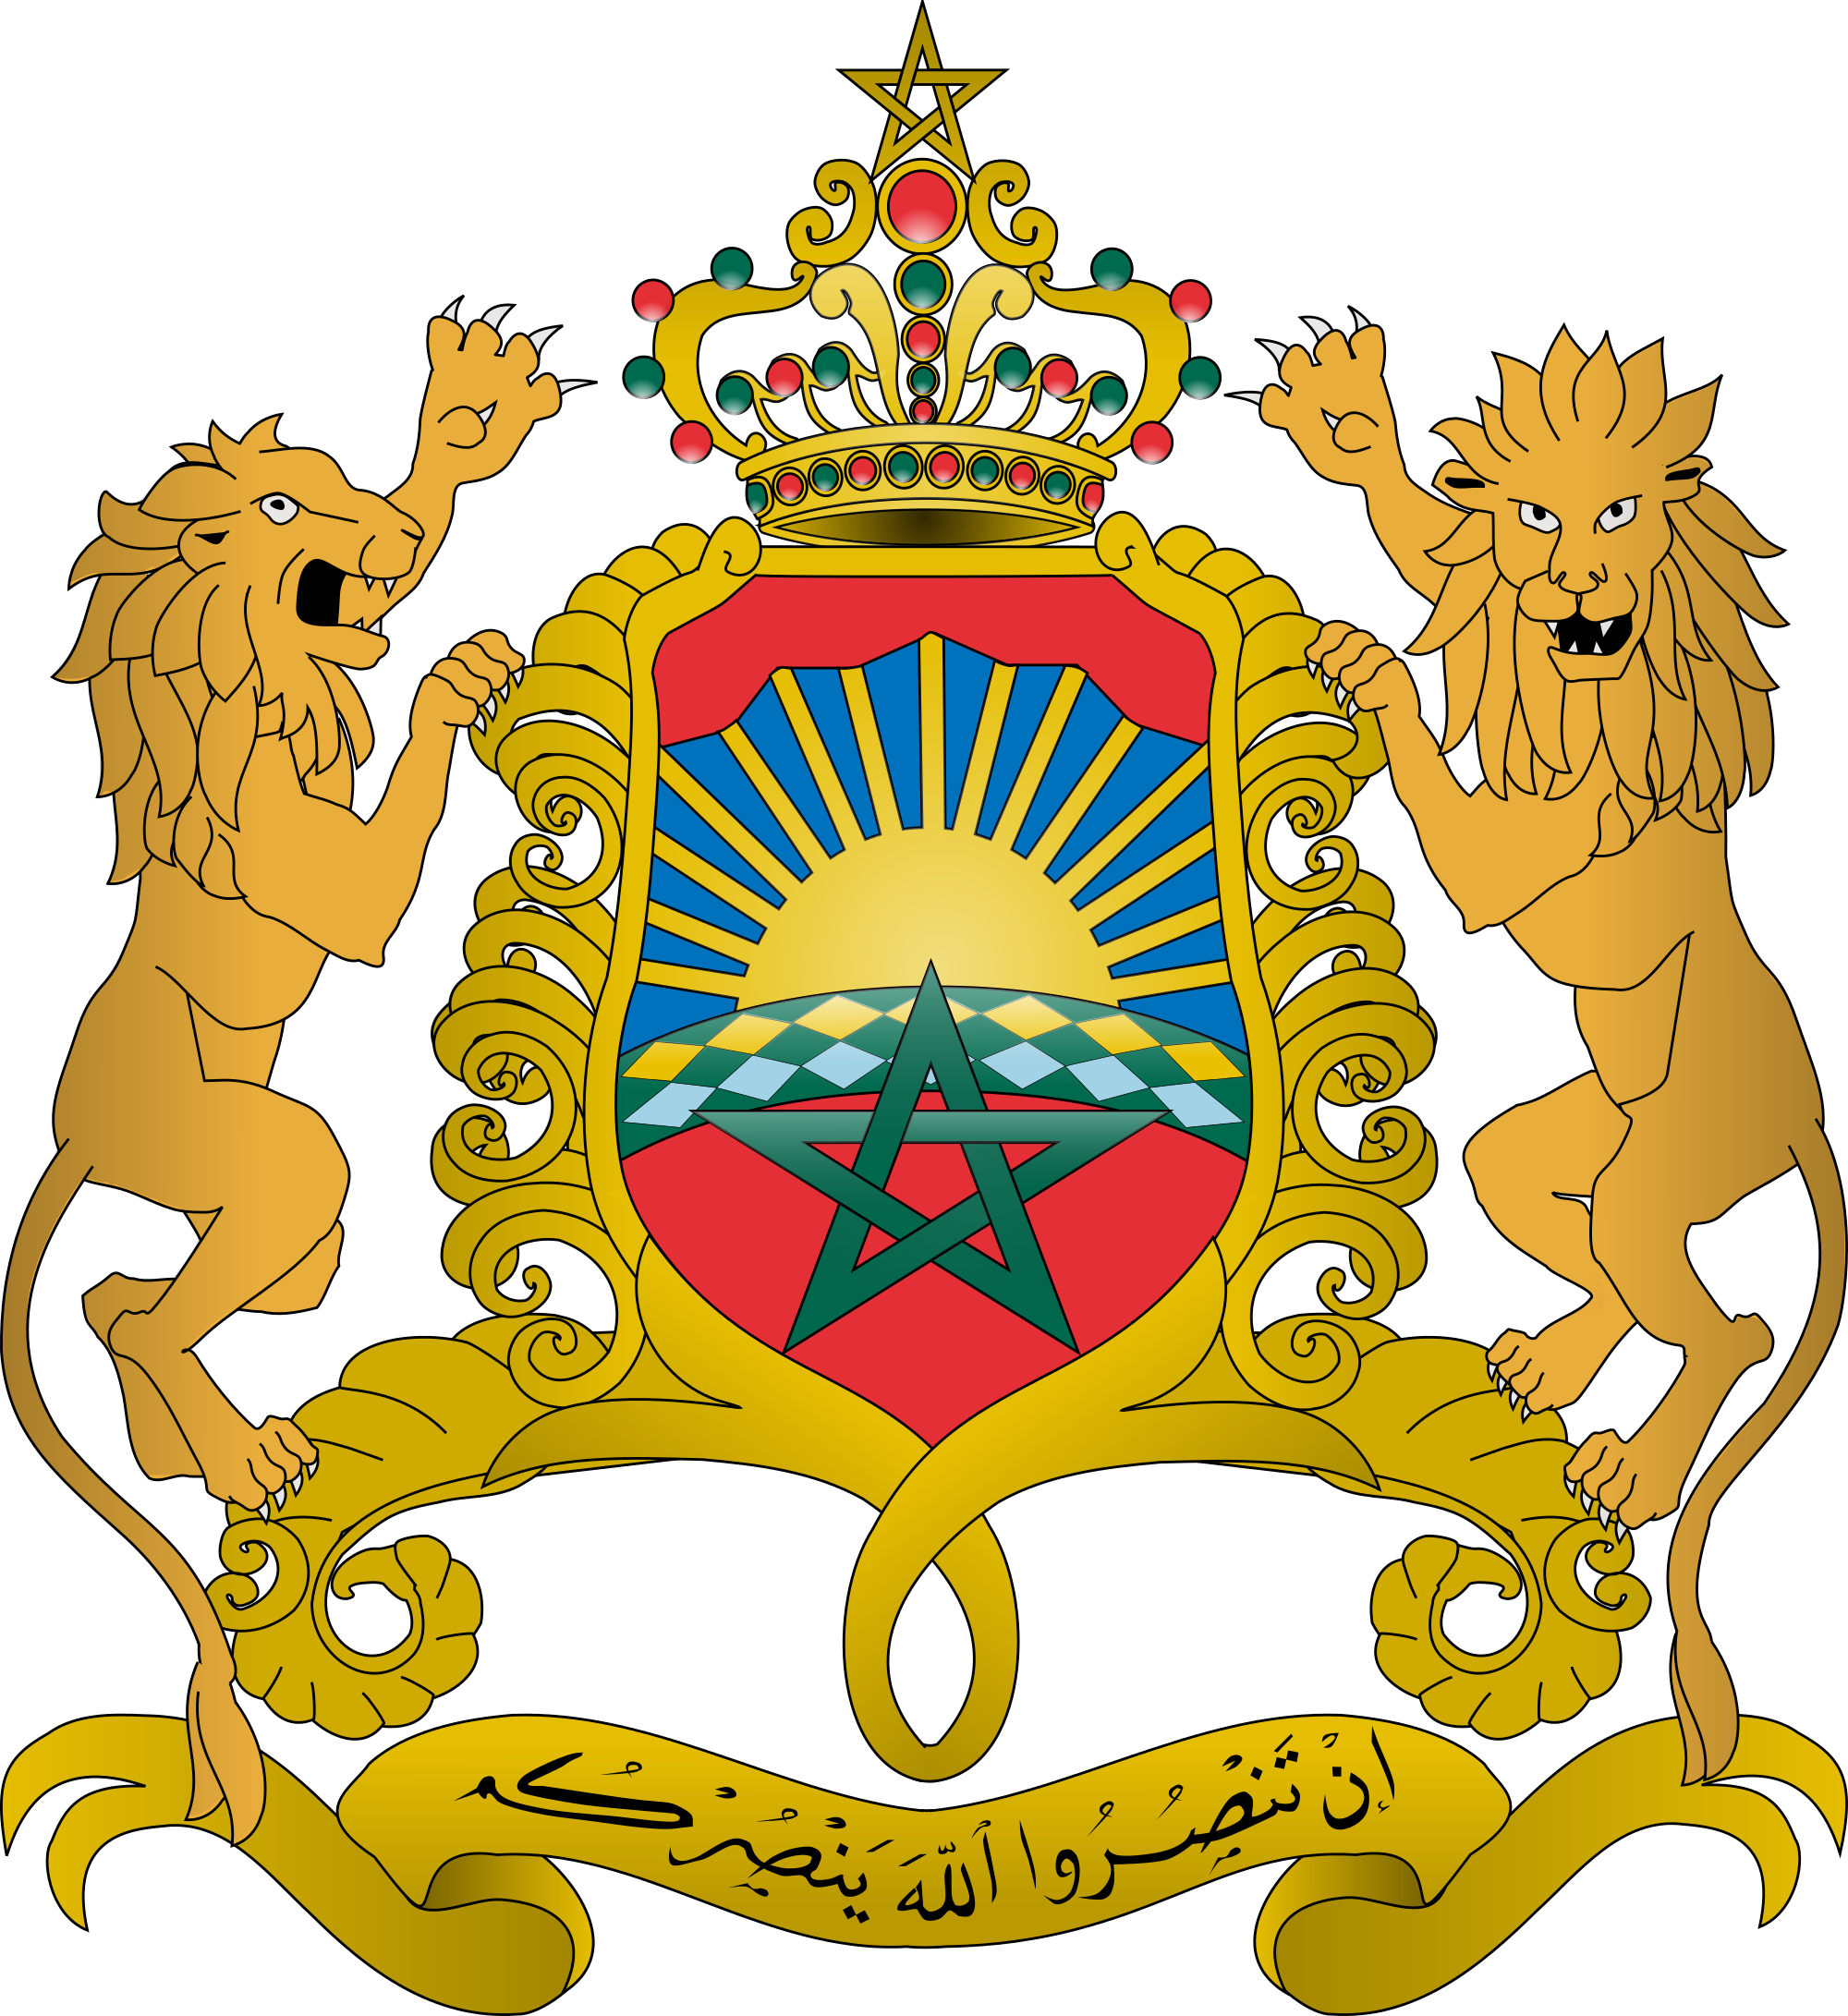 Marruecos (MNI)